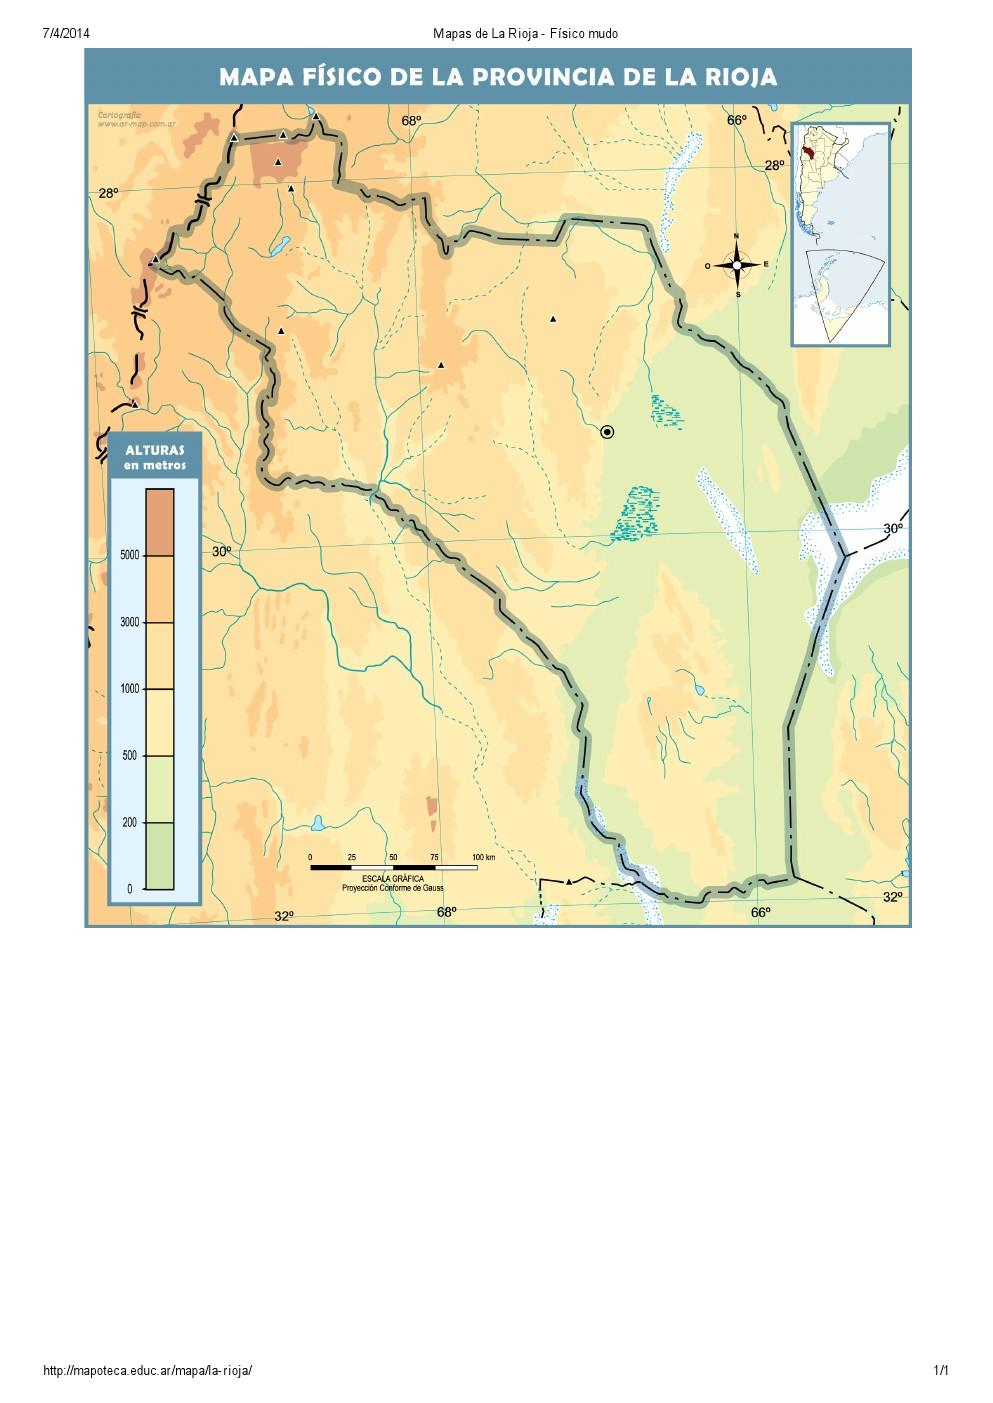 Mapa mudo de ríos de La Rioja. Mapoteca de Educ.ar